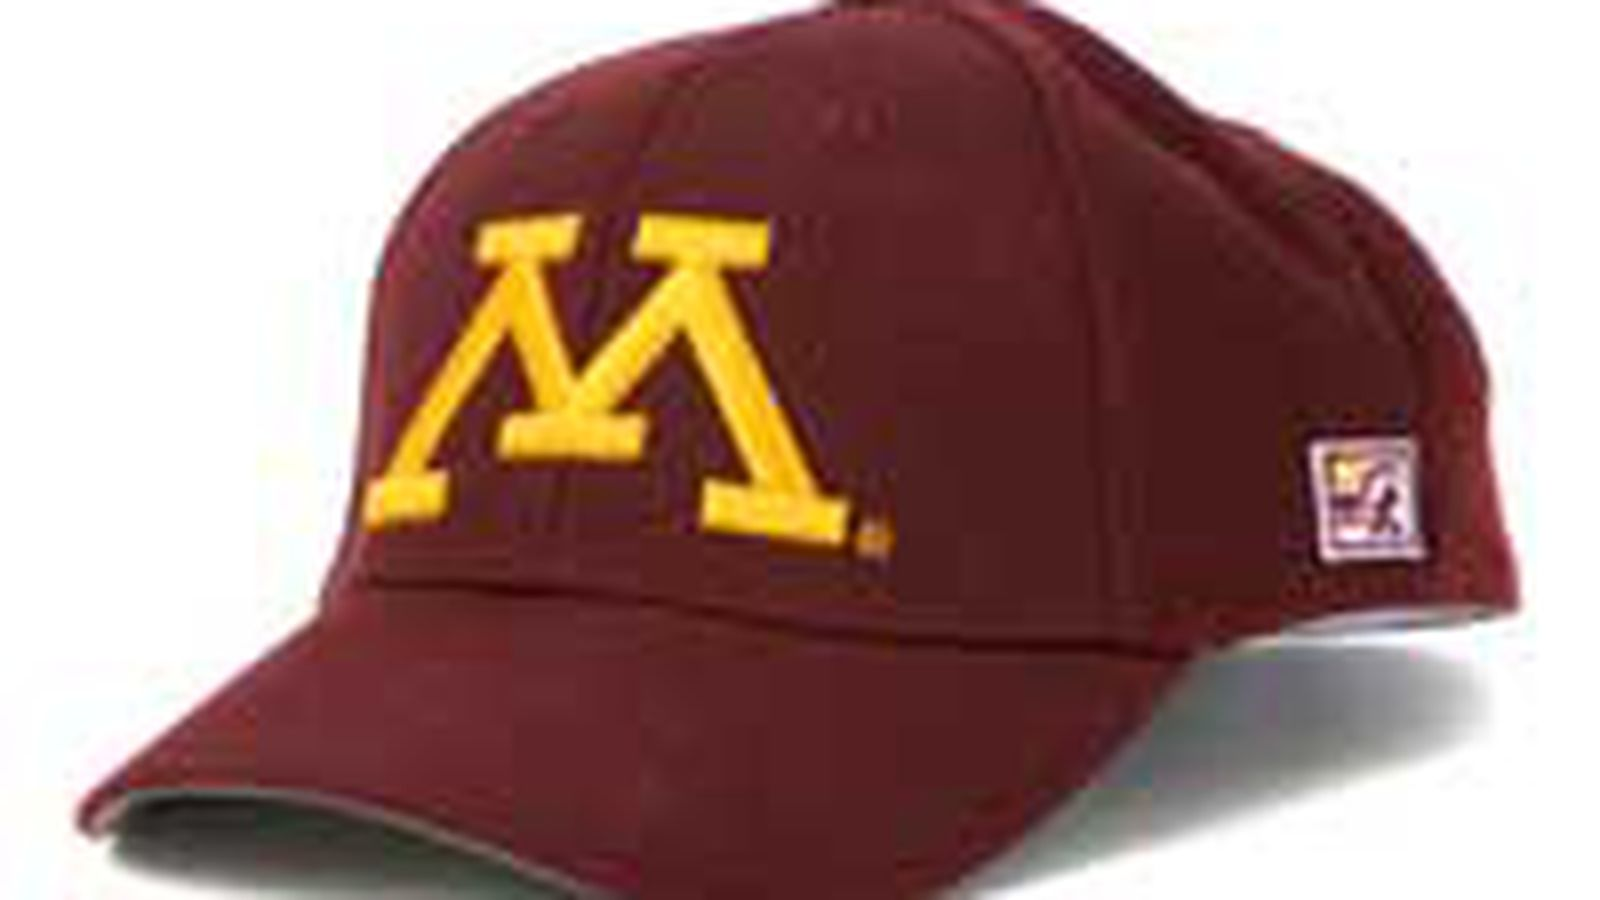 Baseball_hat.0